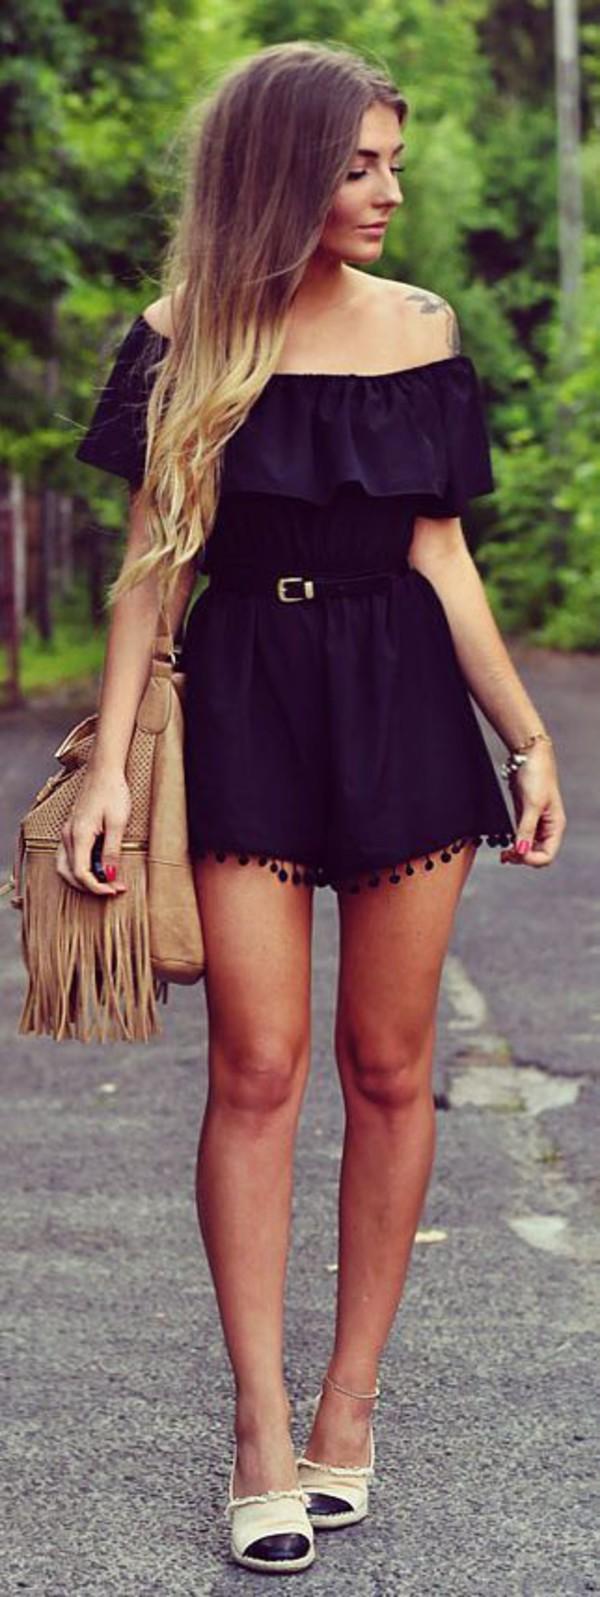 Black dress we heart it - Jumpsuit Black Picture From We Heart It Weheartit Romper Belt Boho Dress Off The Shoulder Wheretoget